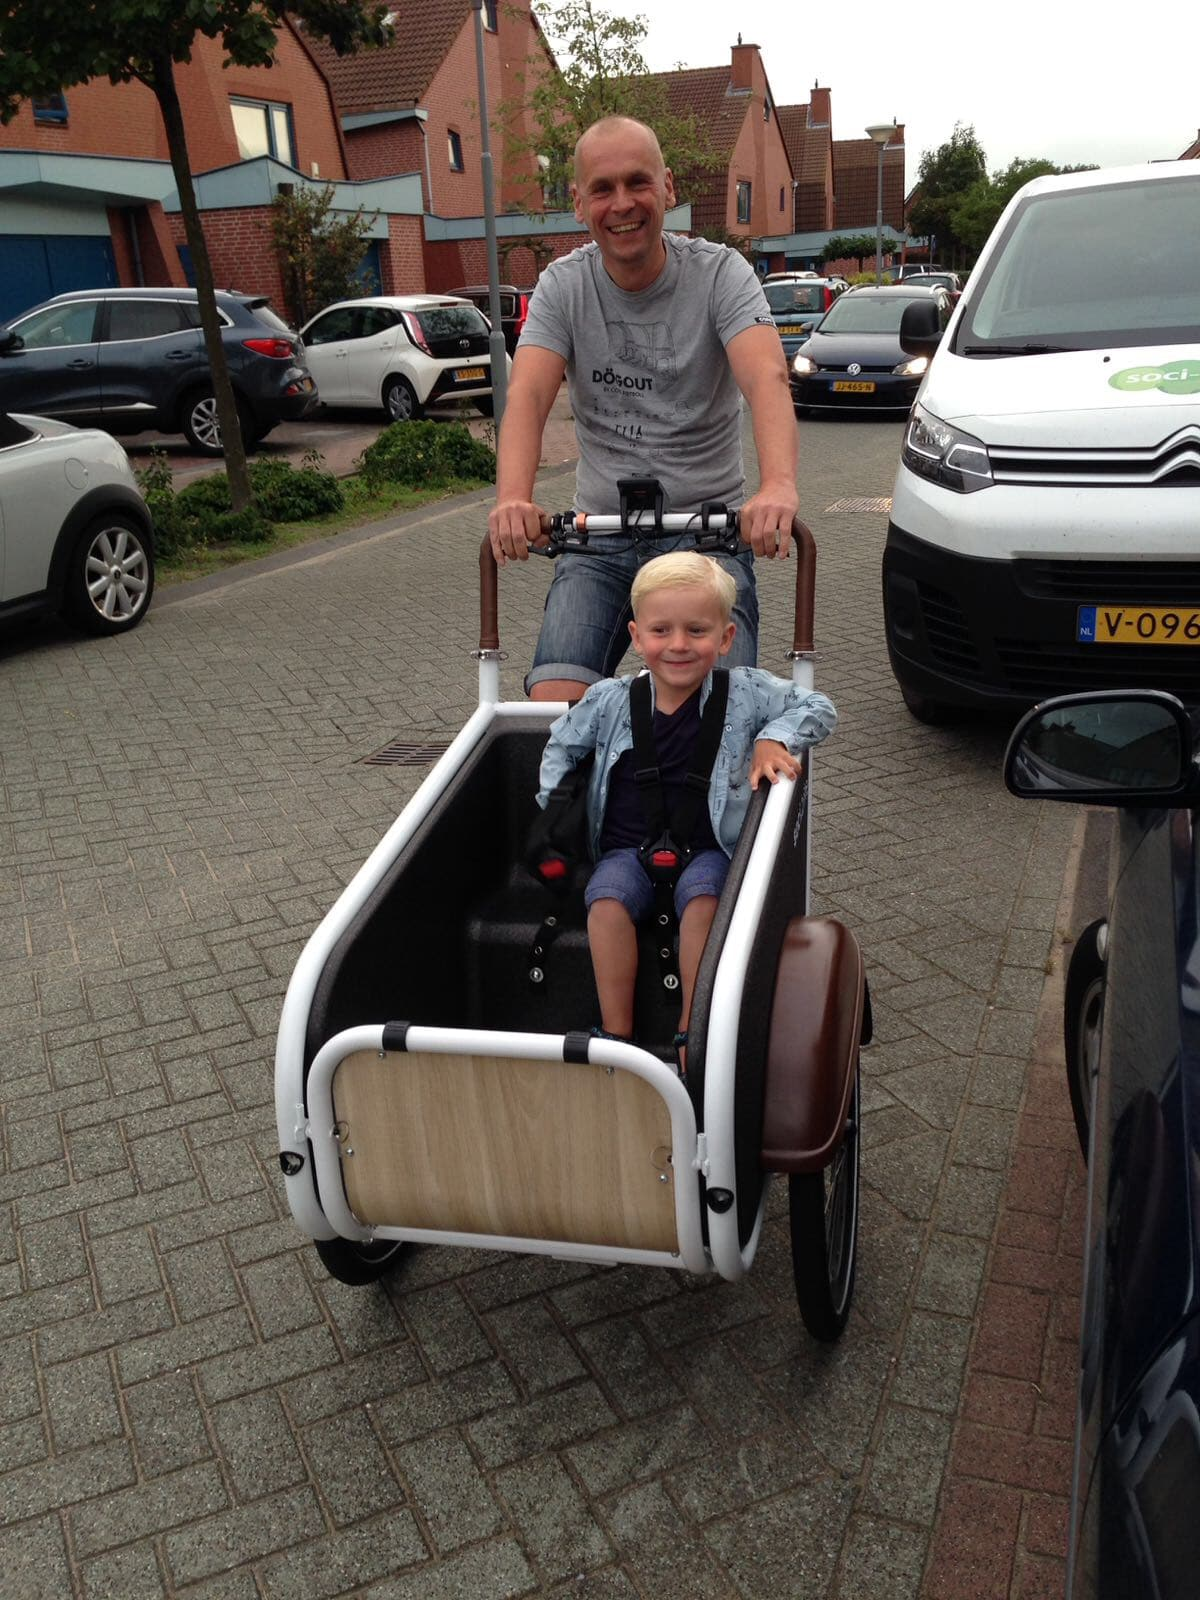 Conclusie soci.bike ambassadeur Sarah Coster-Apeldoorn